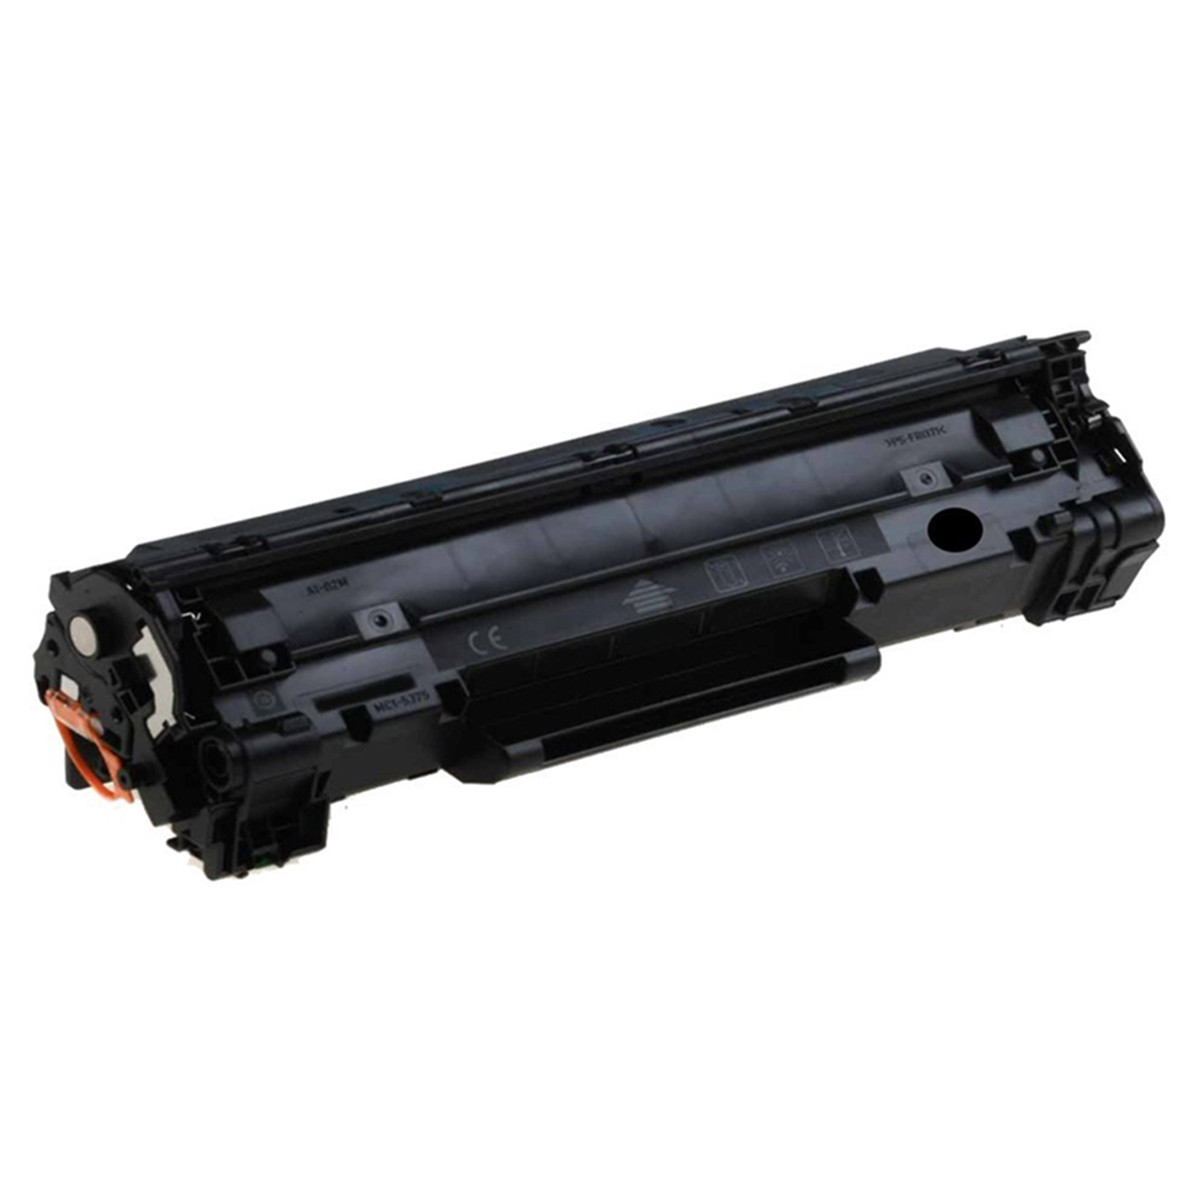 TONER HP CF 400X, CF400X, 400 X ( M252DW, M252, M272, 277 )